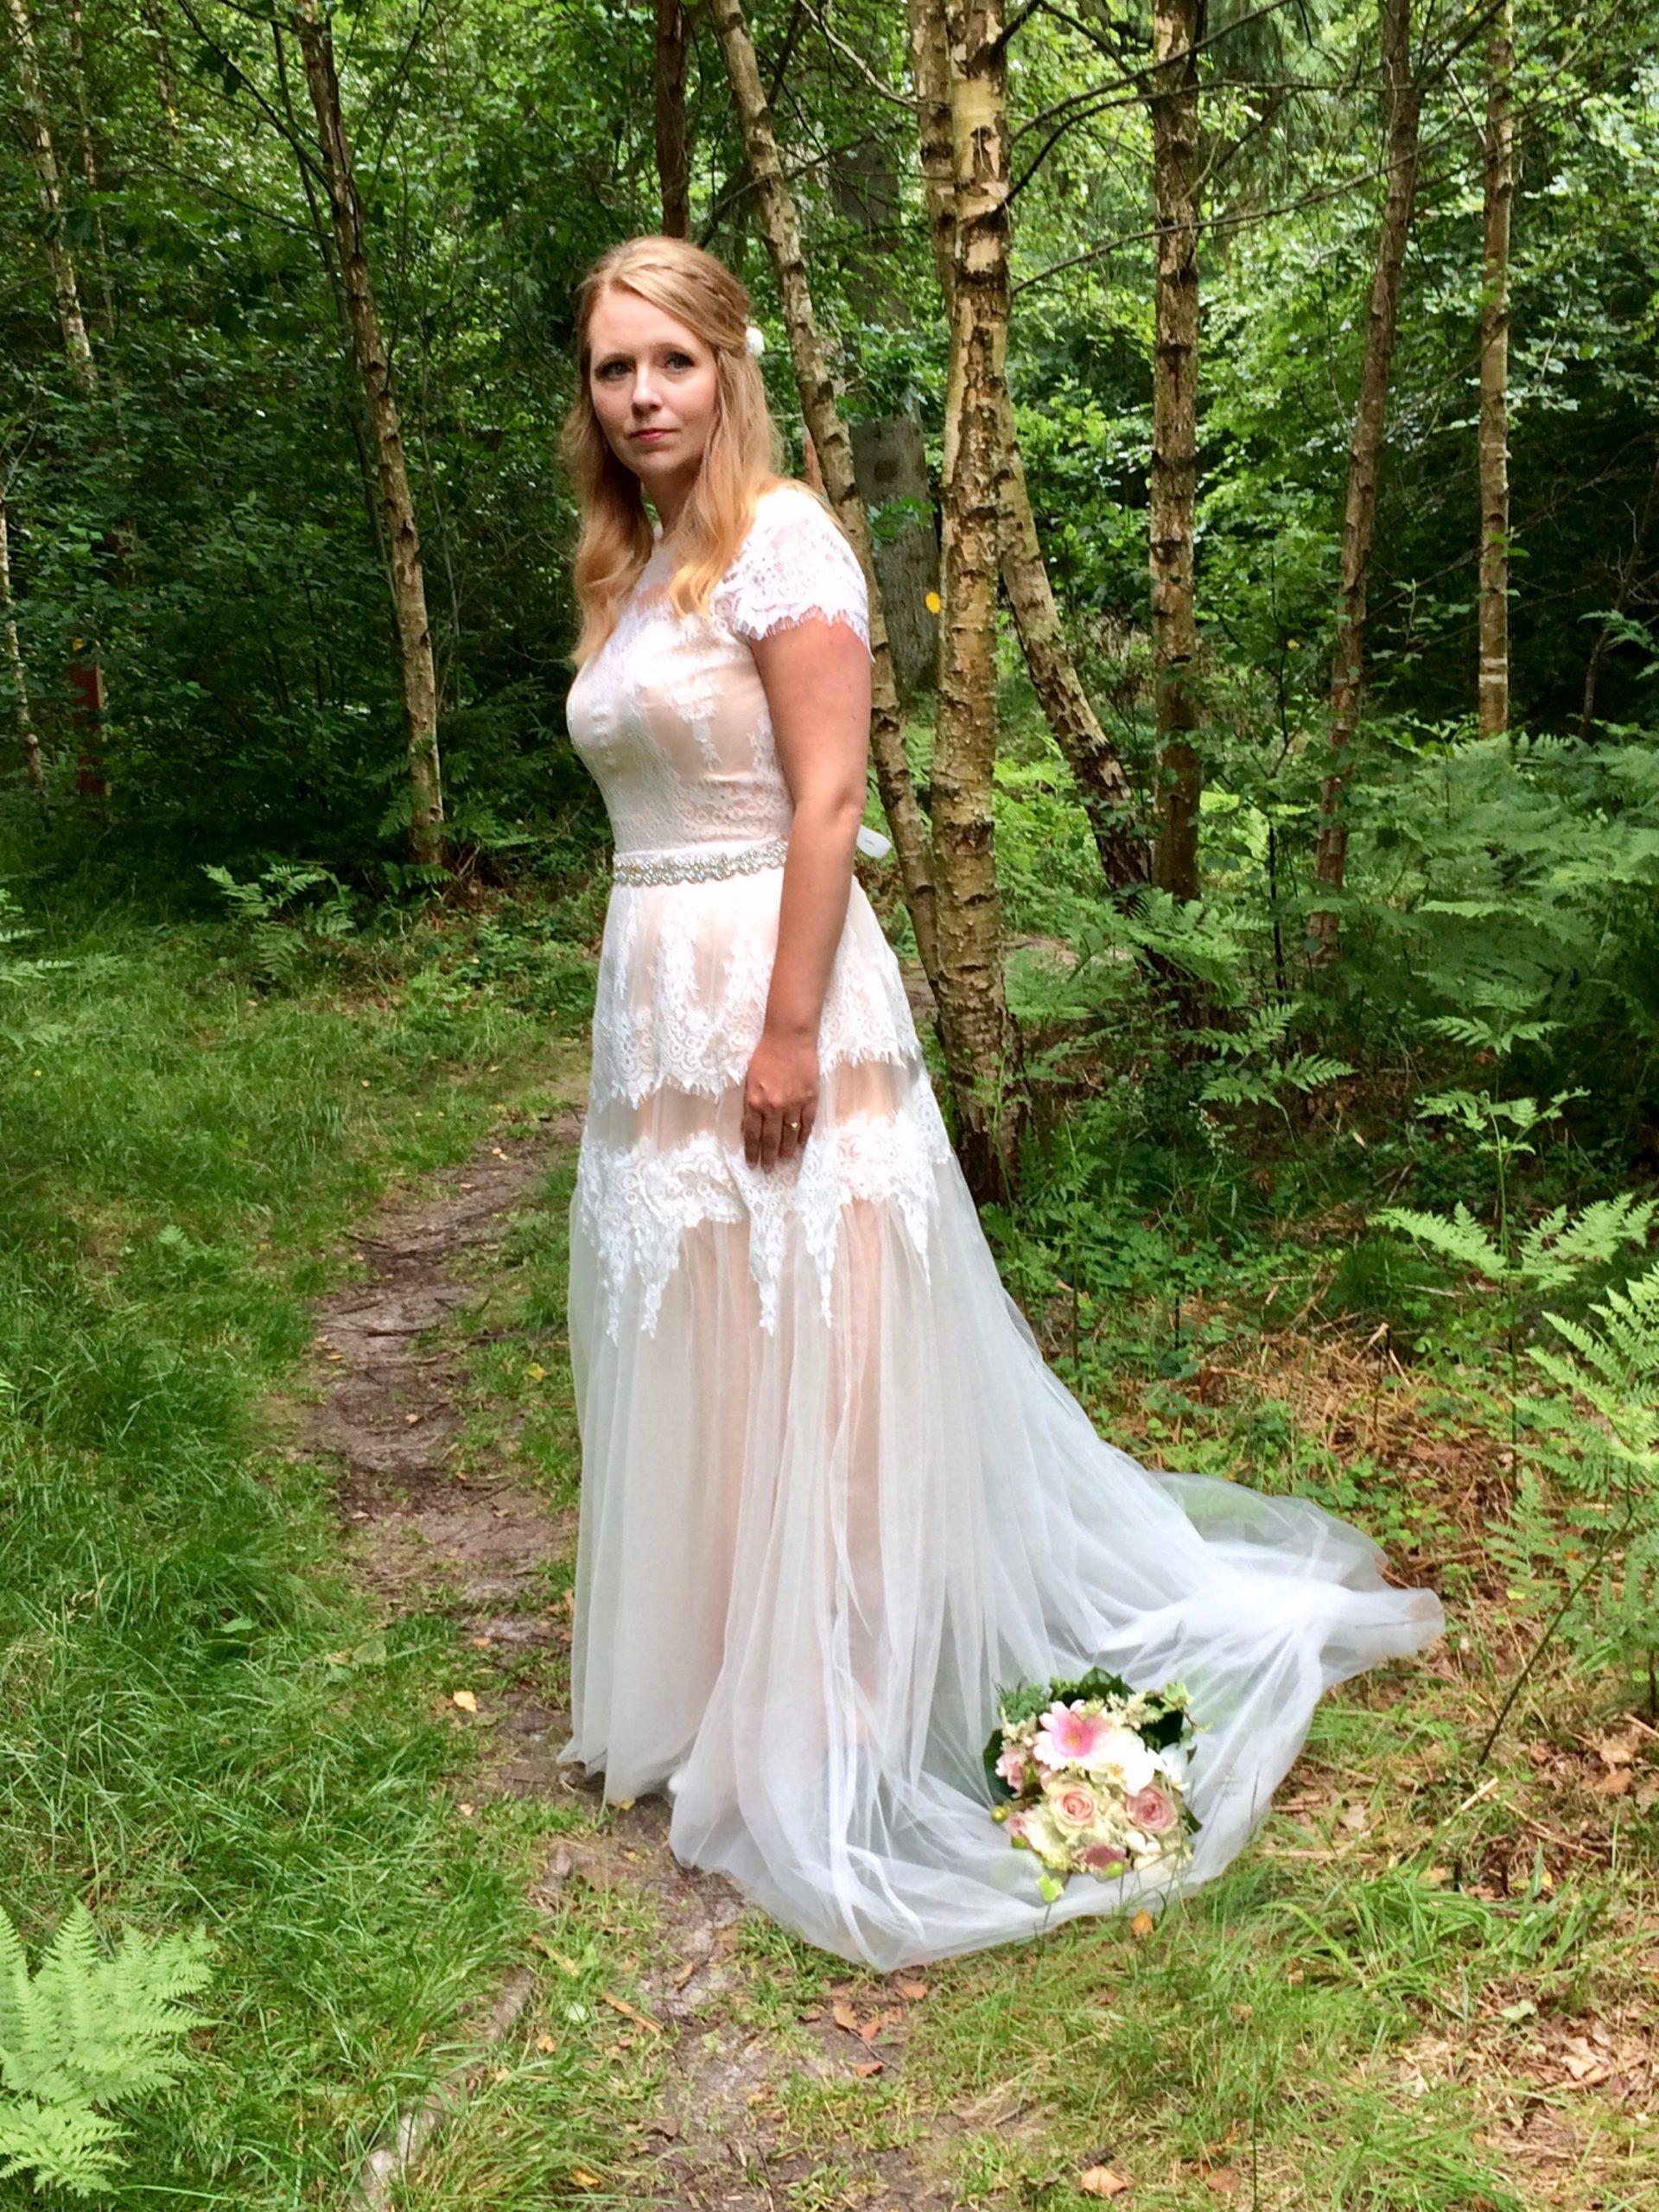 Jeanette Skovgaard Jokumsen brudekjole